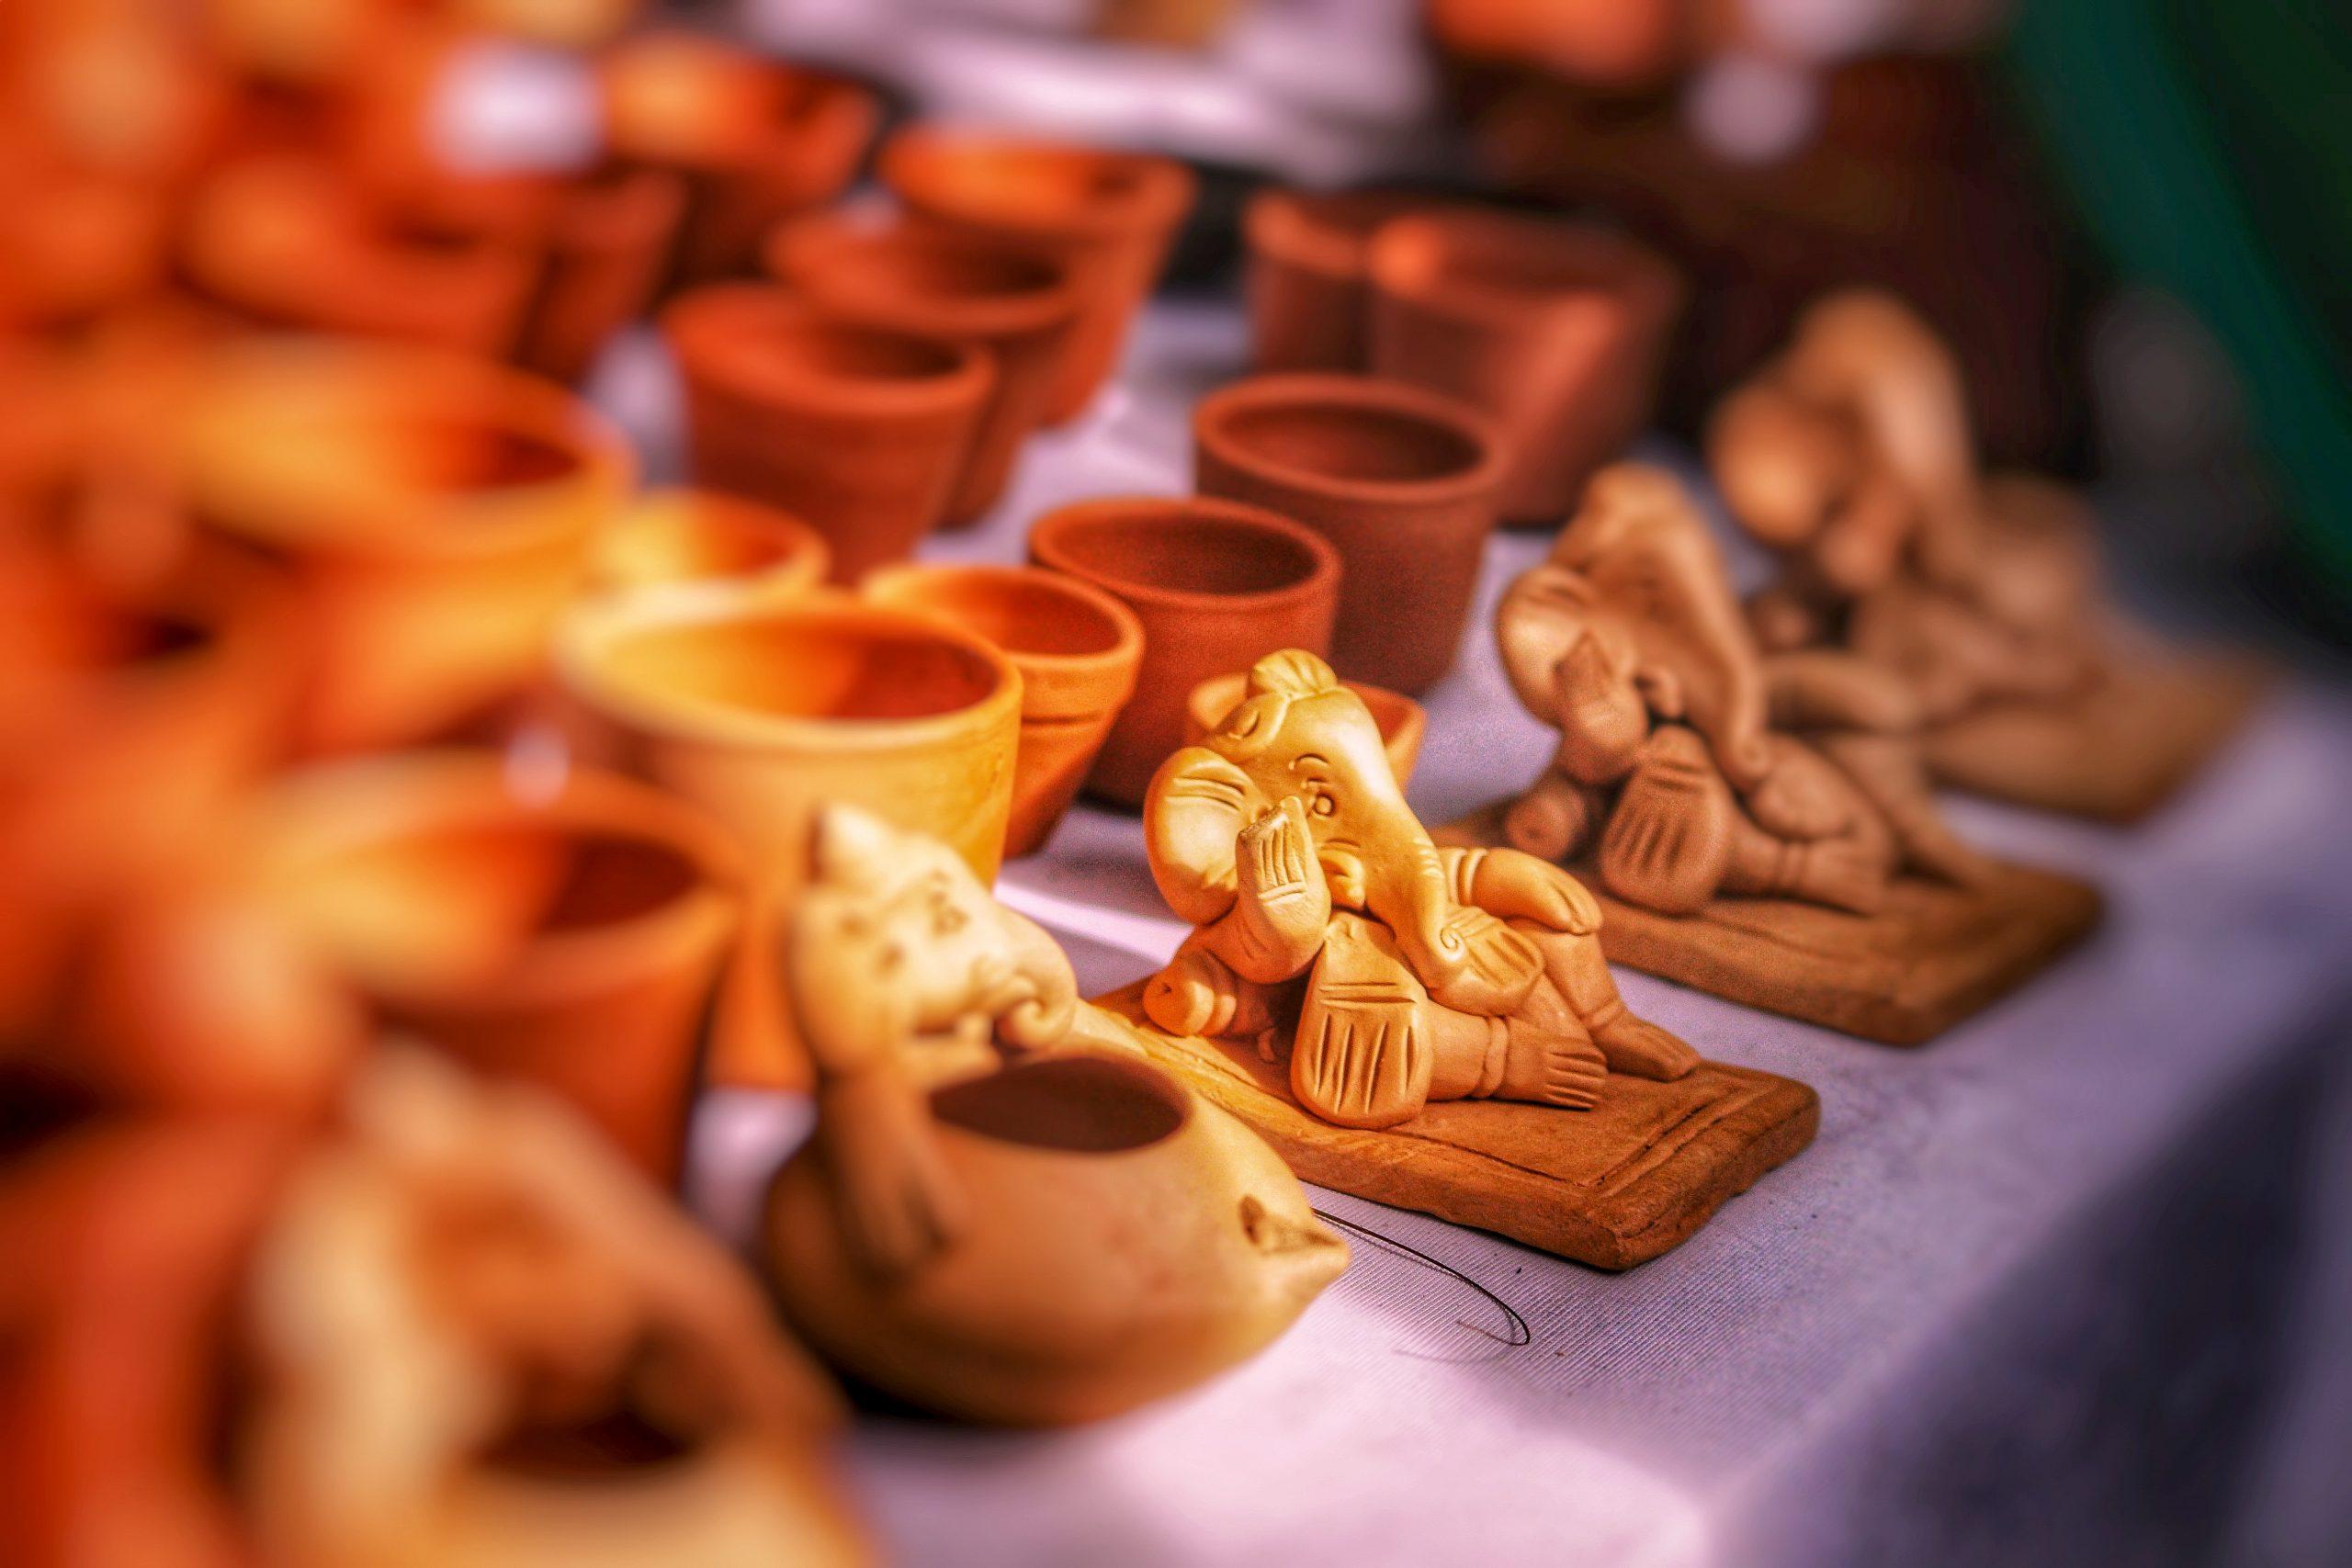 Clay idols and pots